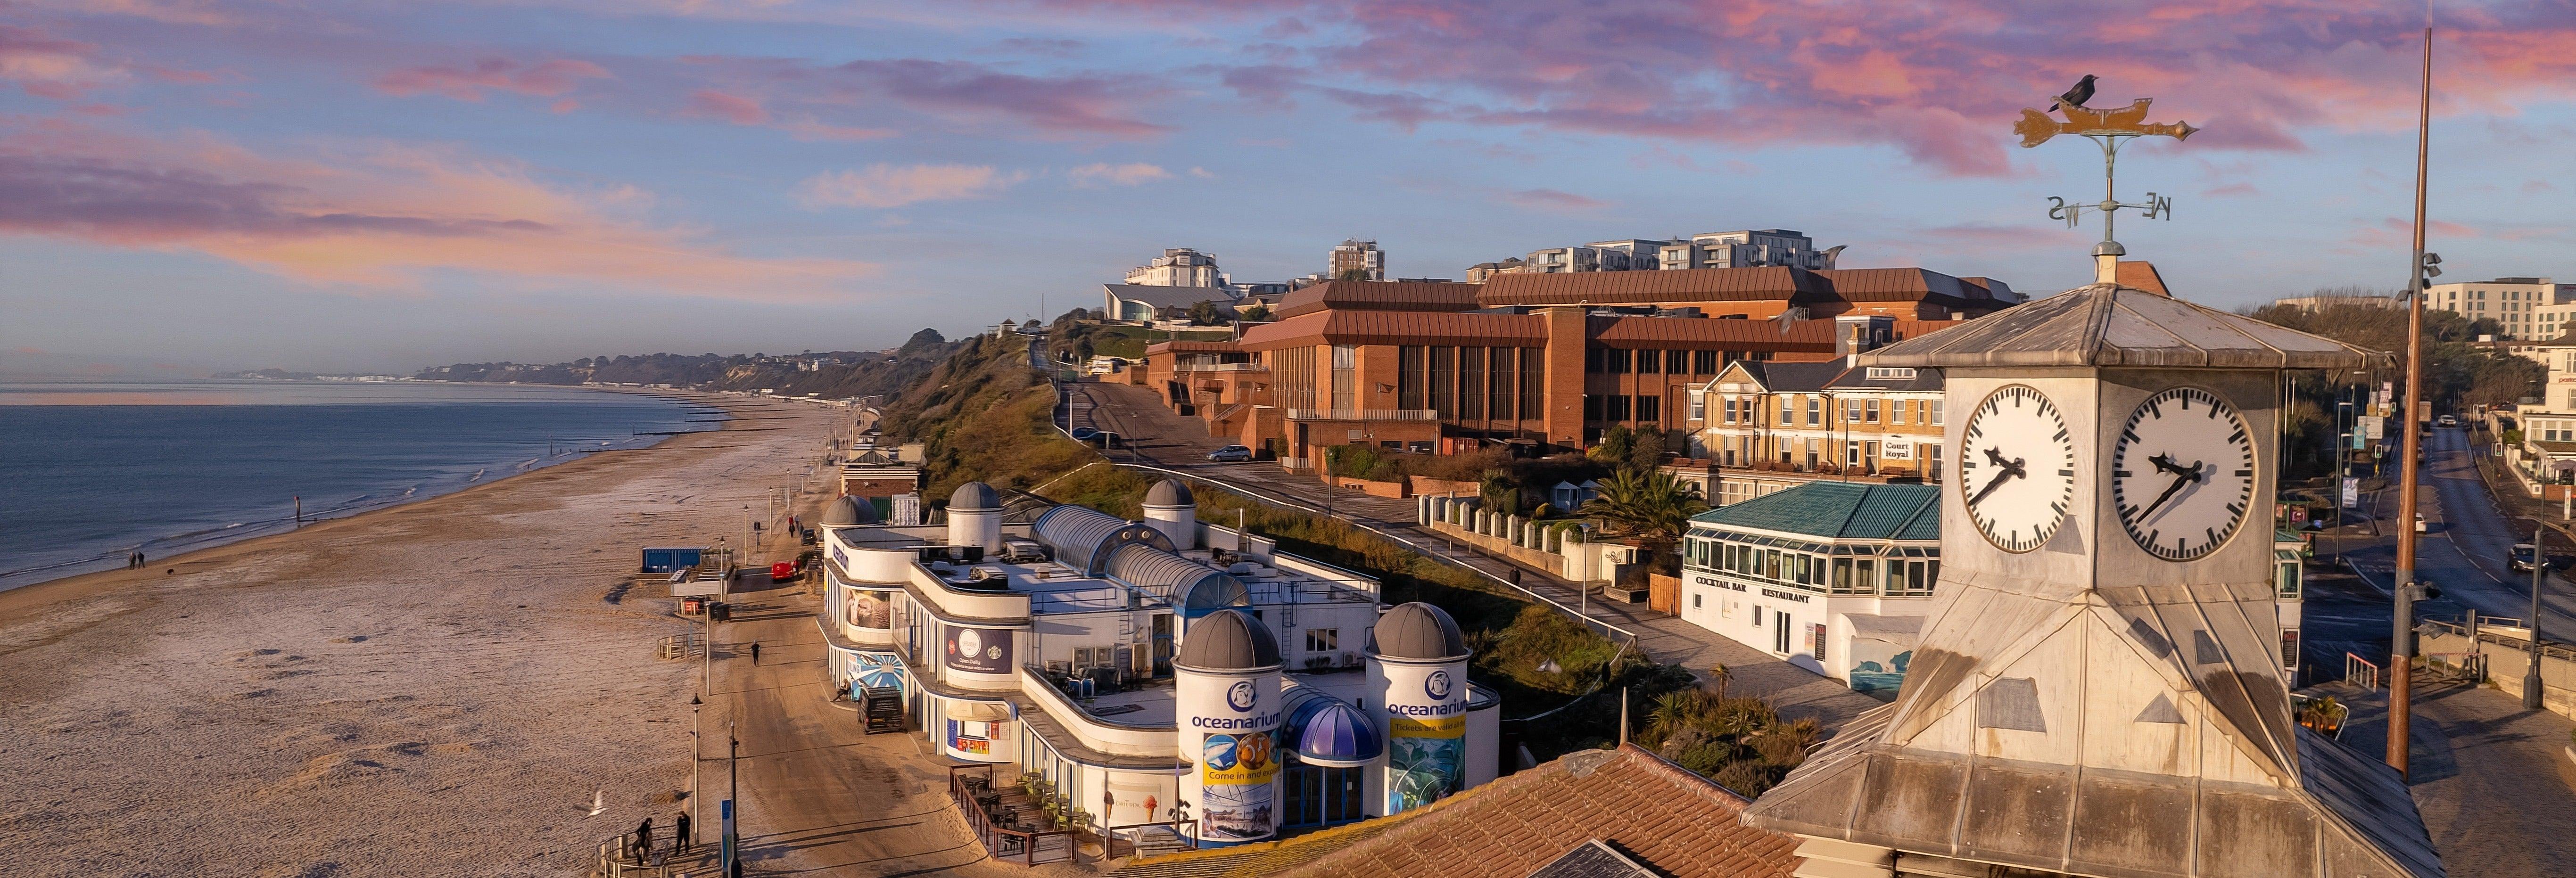 Autobús turístico de Bournemouth